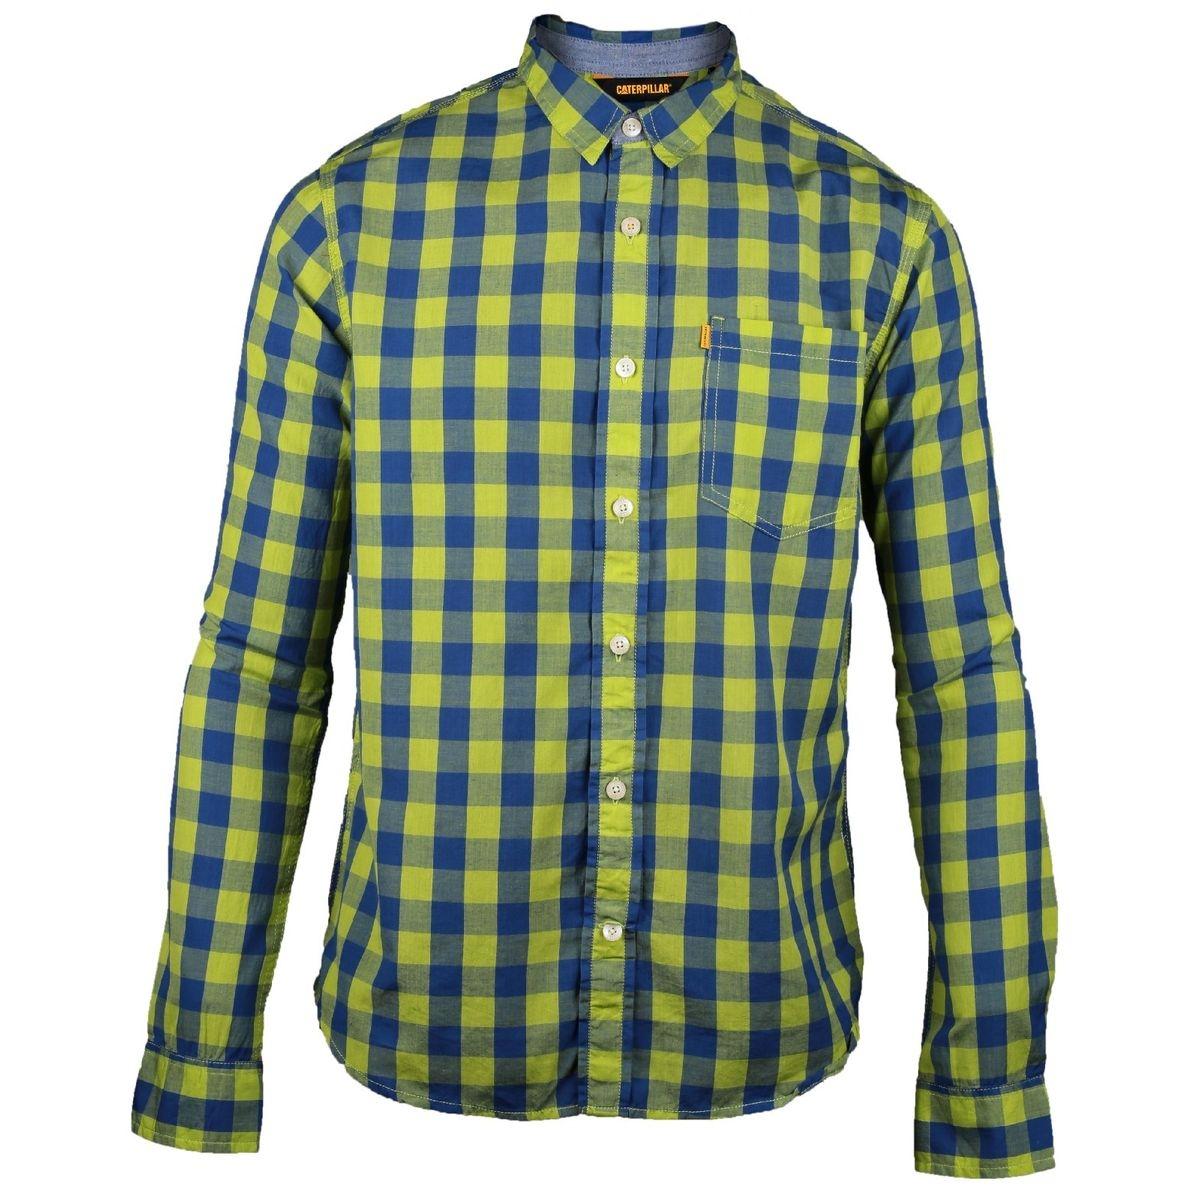 Chemise à carreaux ELEVATE